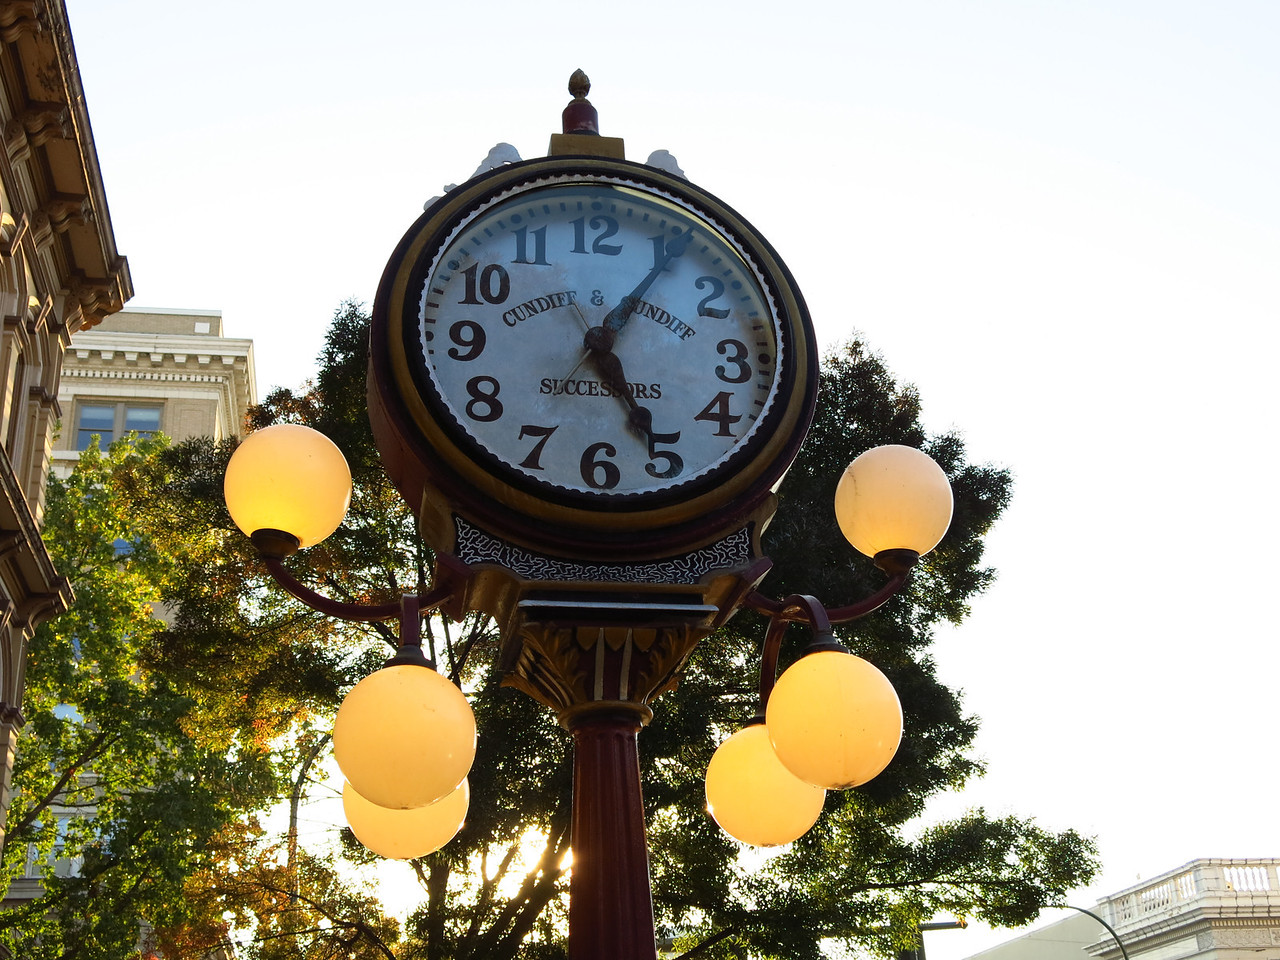 A clock on the sidewalk on Main Stree.